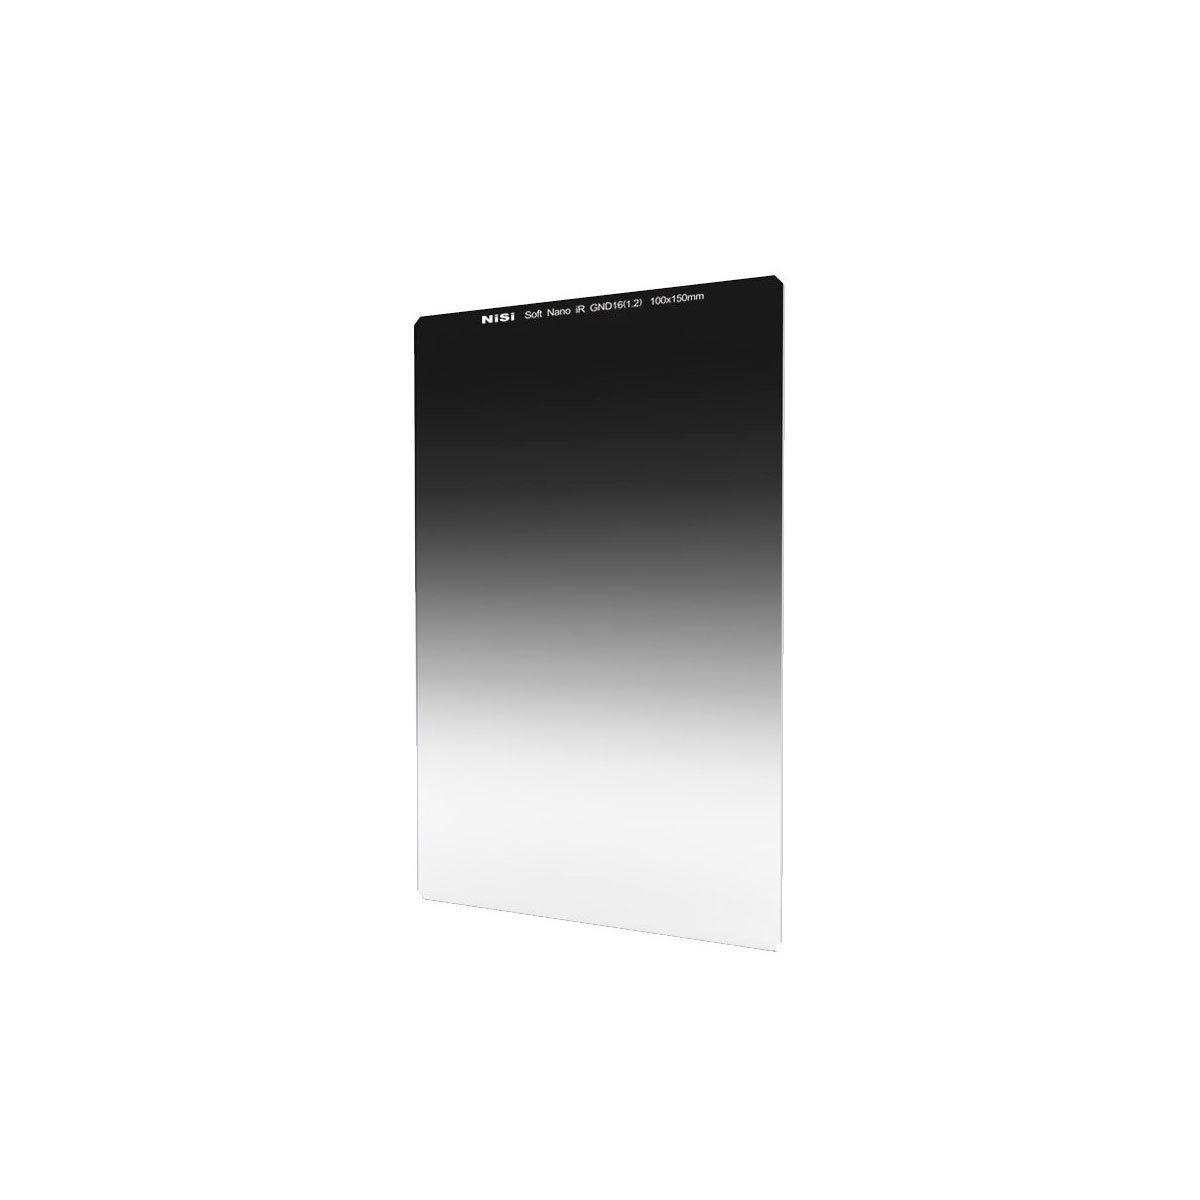 NiSi 100x150mm GND2 0.3 Squarefilter Nano IR GND soft – pehmeä puoliharmaasuodin